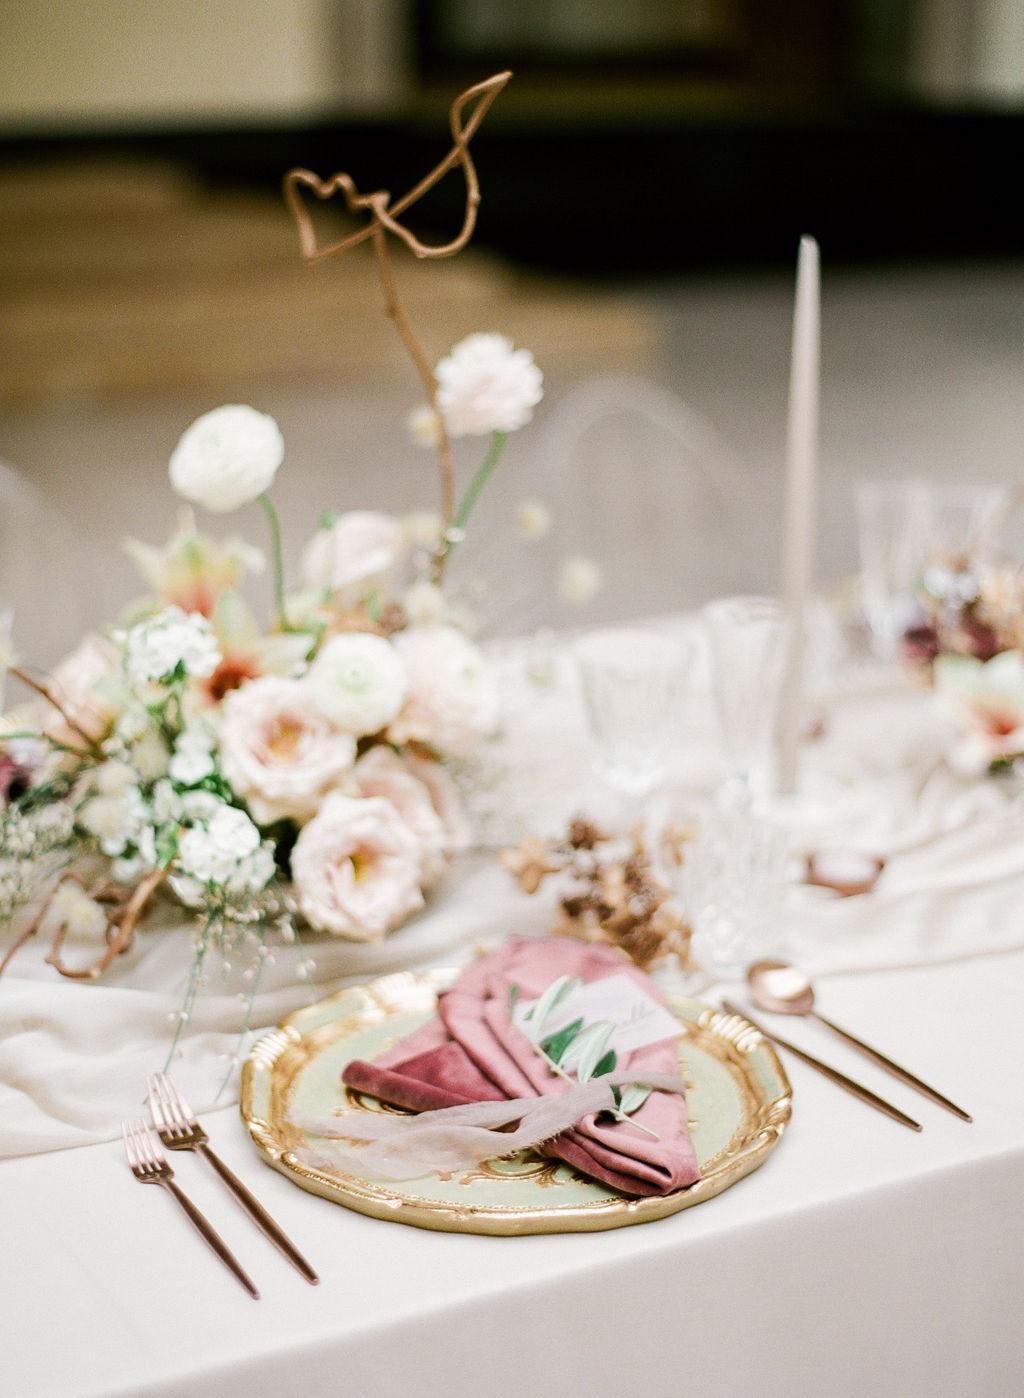 artiese-ago-wedding-editorial-000423720016.jpg